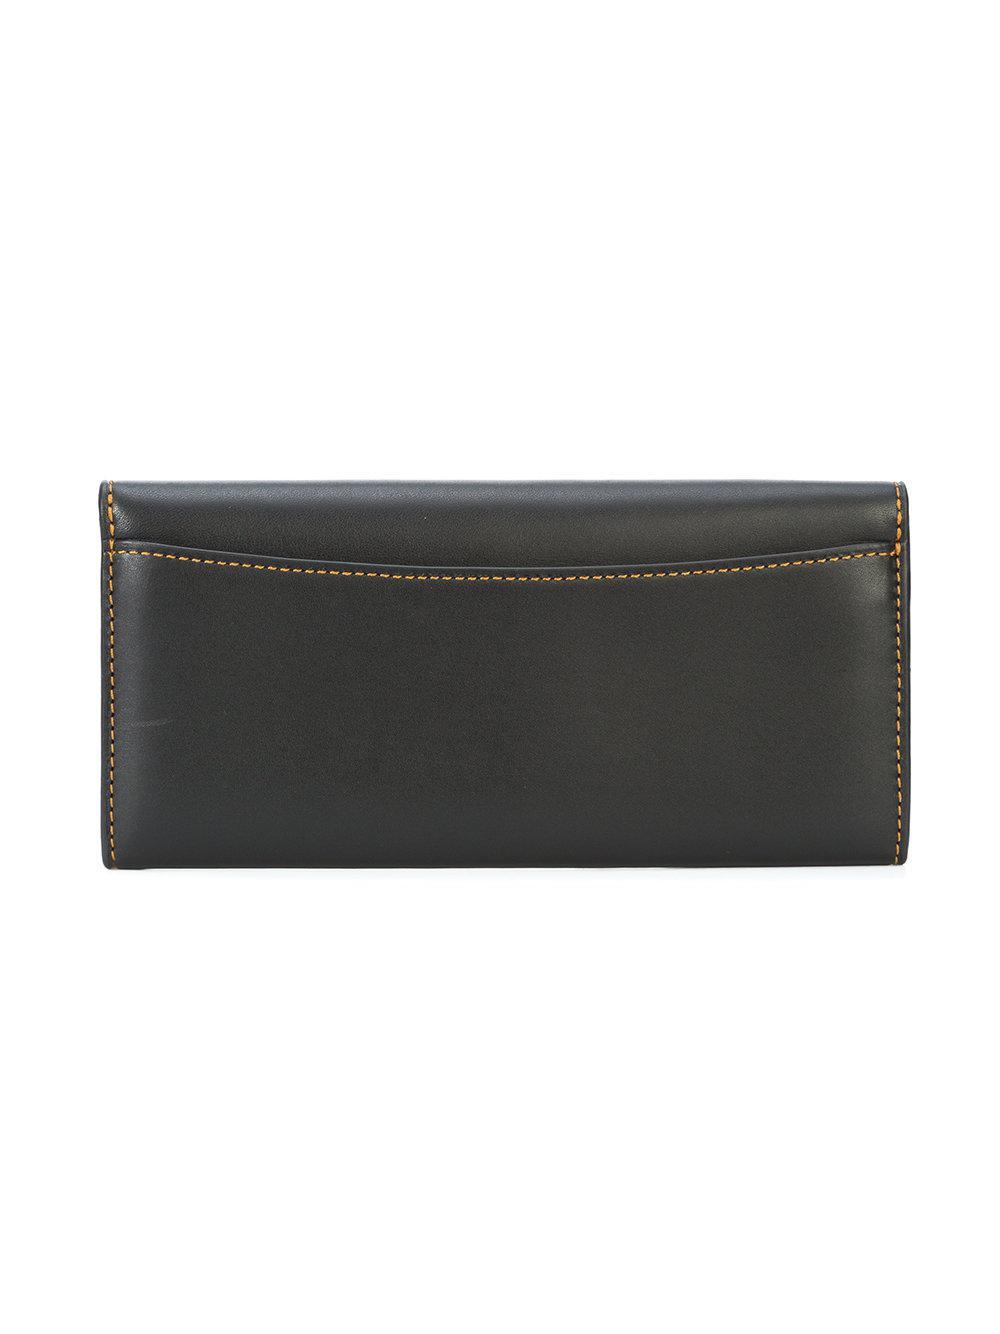 6bb7d5bbdbdc Lyst - COACH Envelope Wallet in Black